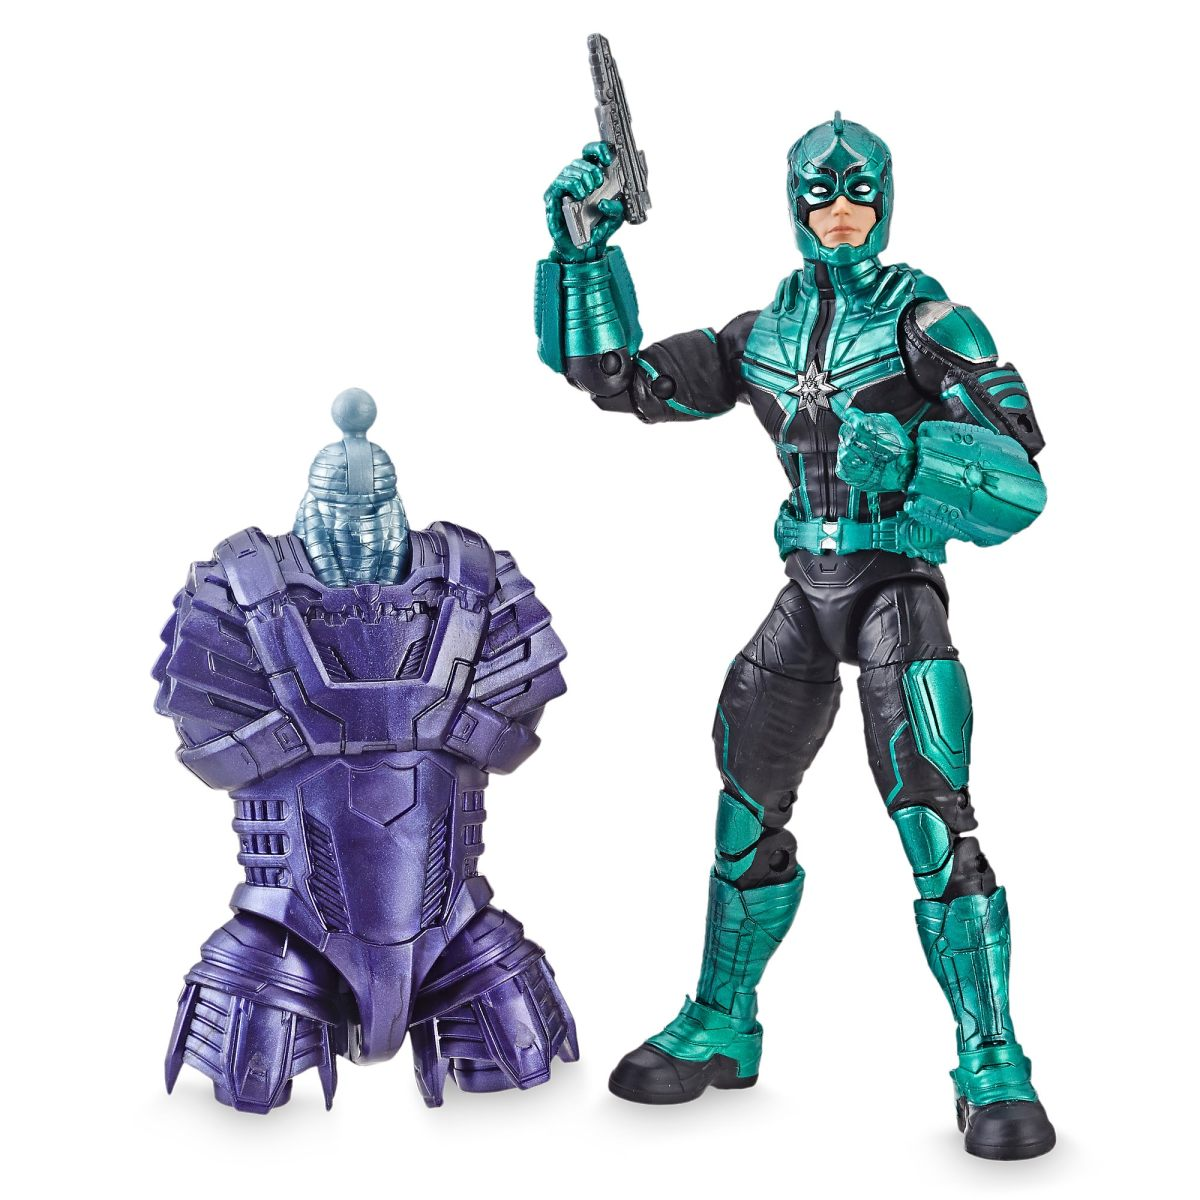 starforce commander action figure - legends series - marvel's